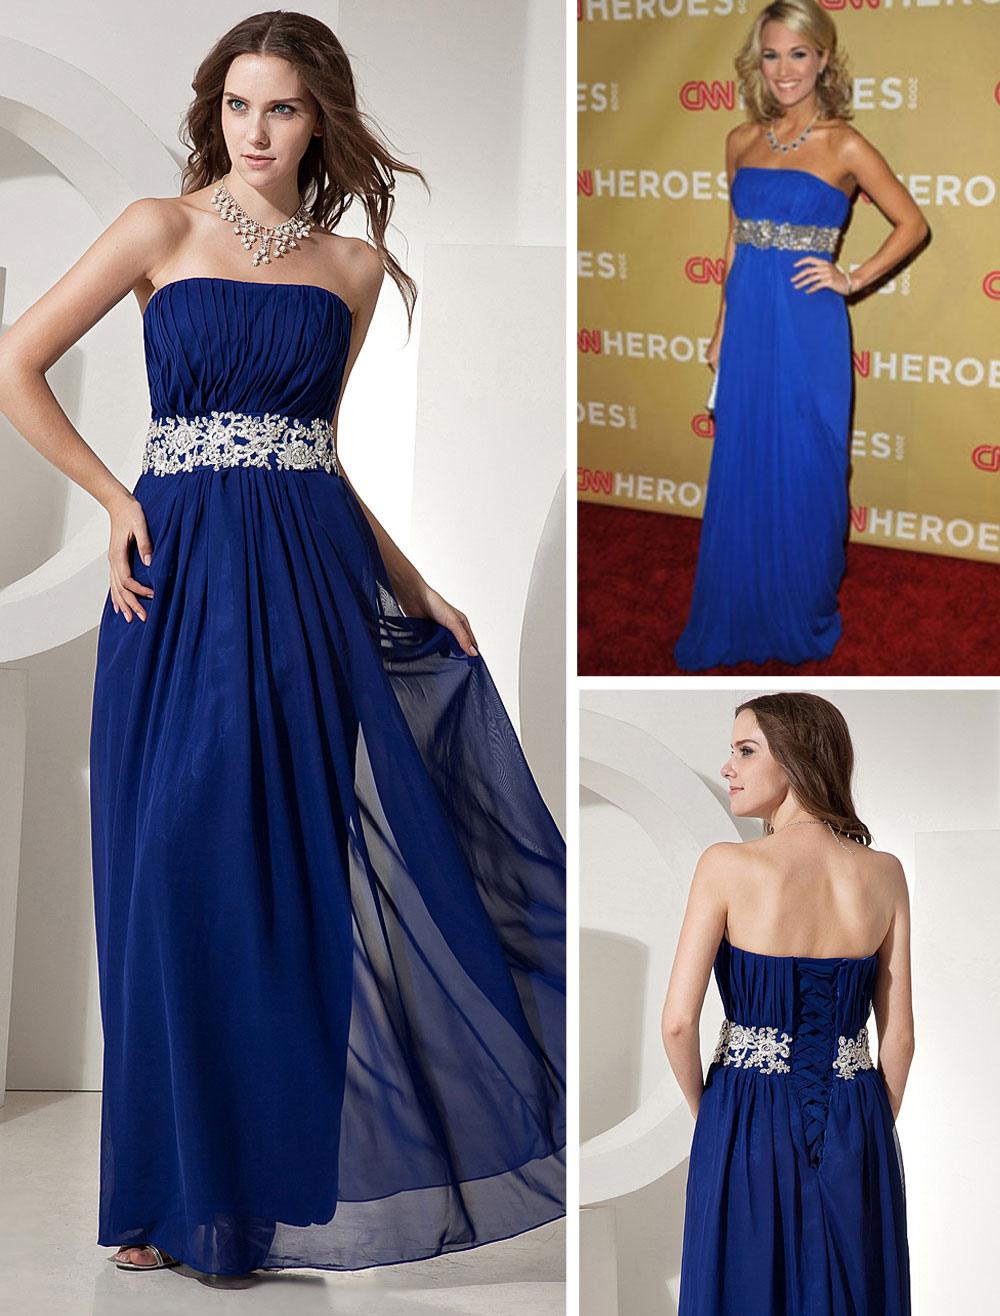 Royal Blue Chiffon Strapless Sweep Train Golden Globe Dress (Wedding Golden Globe Dresses) photo